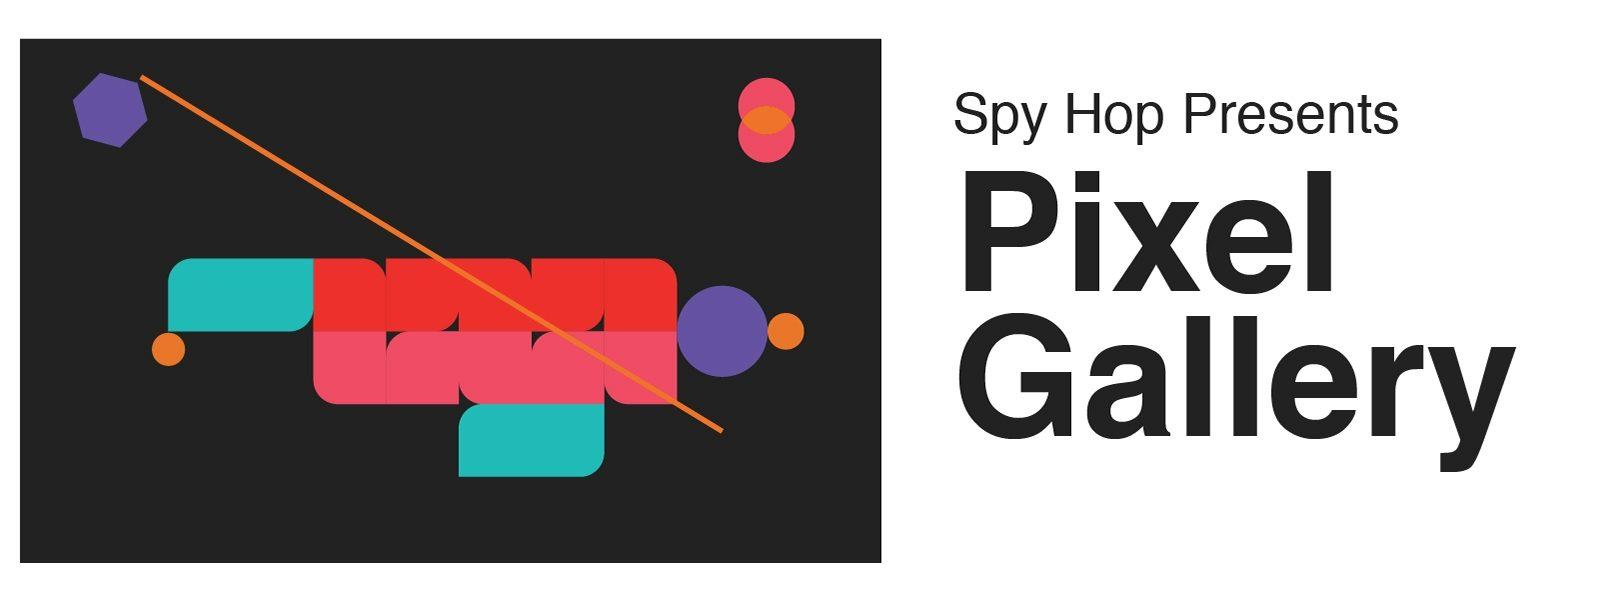 2019_PixelGallery_1600x600_Header